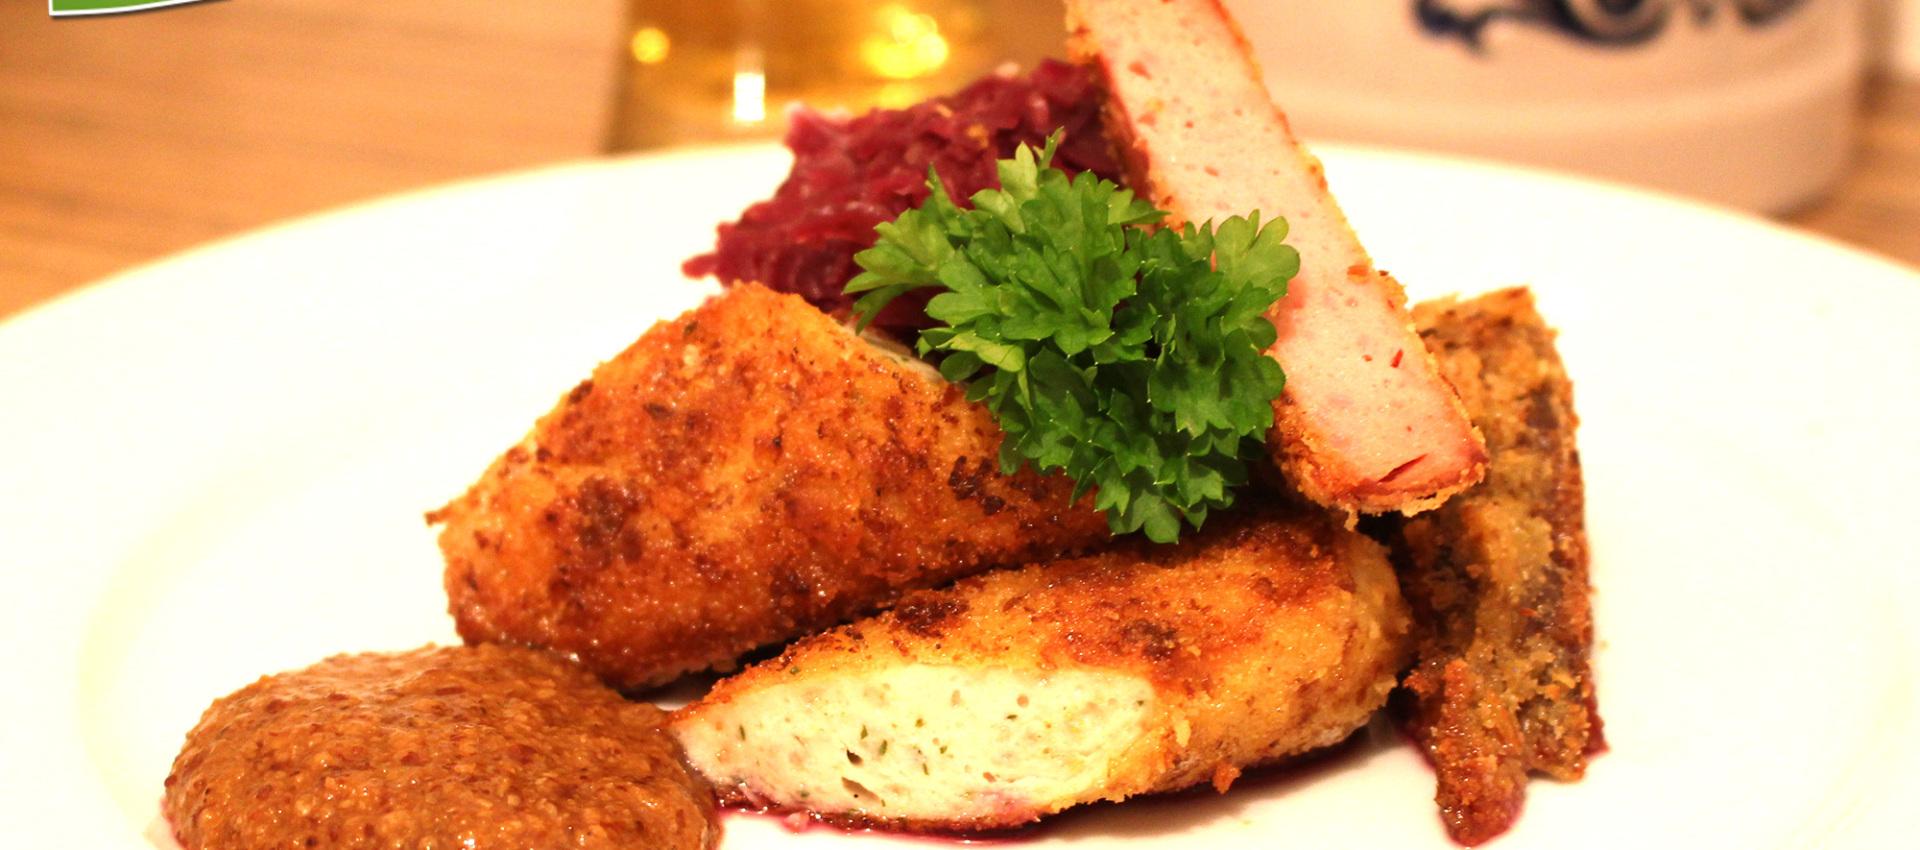 Rezept panierte Weißwurst & panierter Laberkäse mit Senf & Breze - Kochbock.de